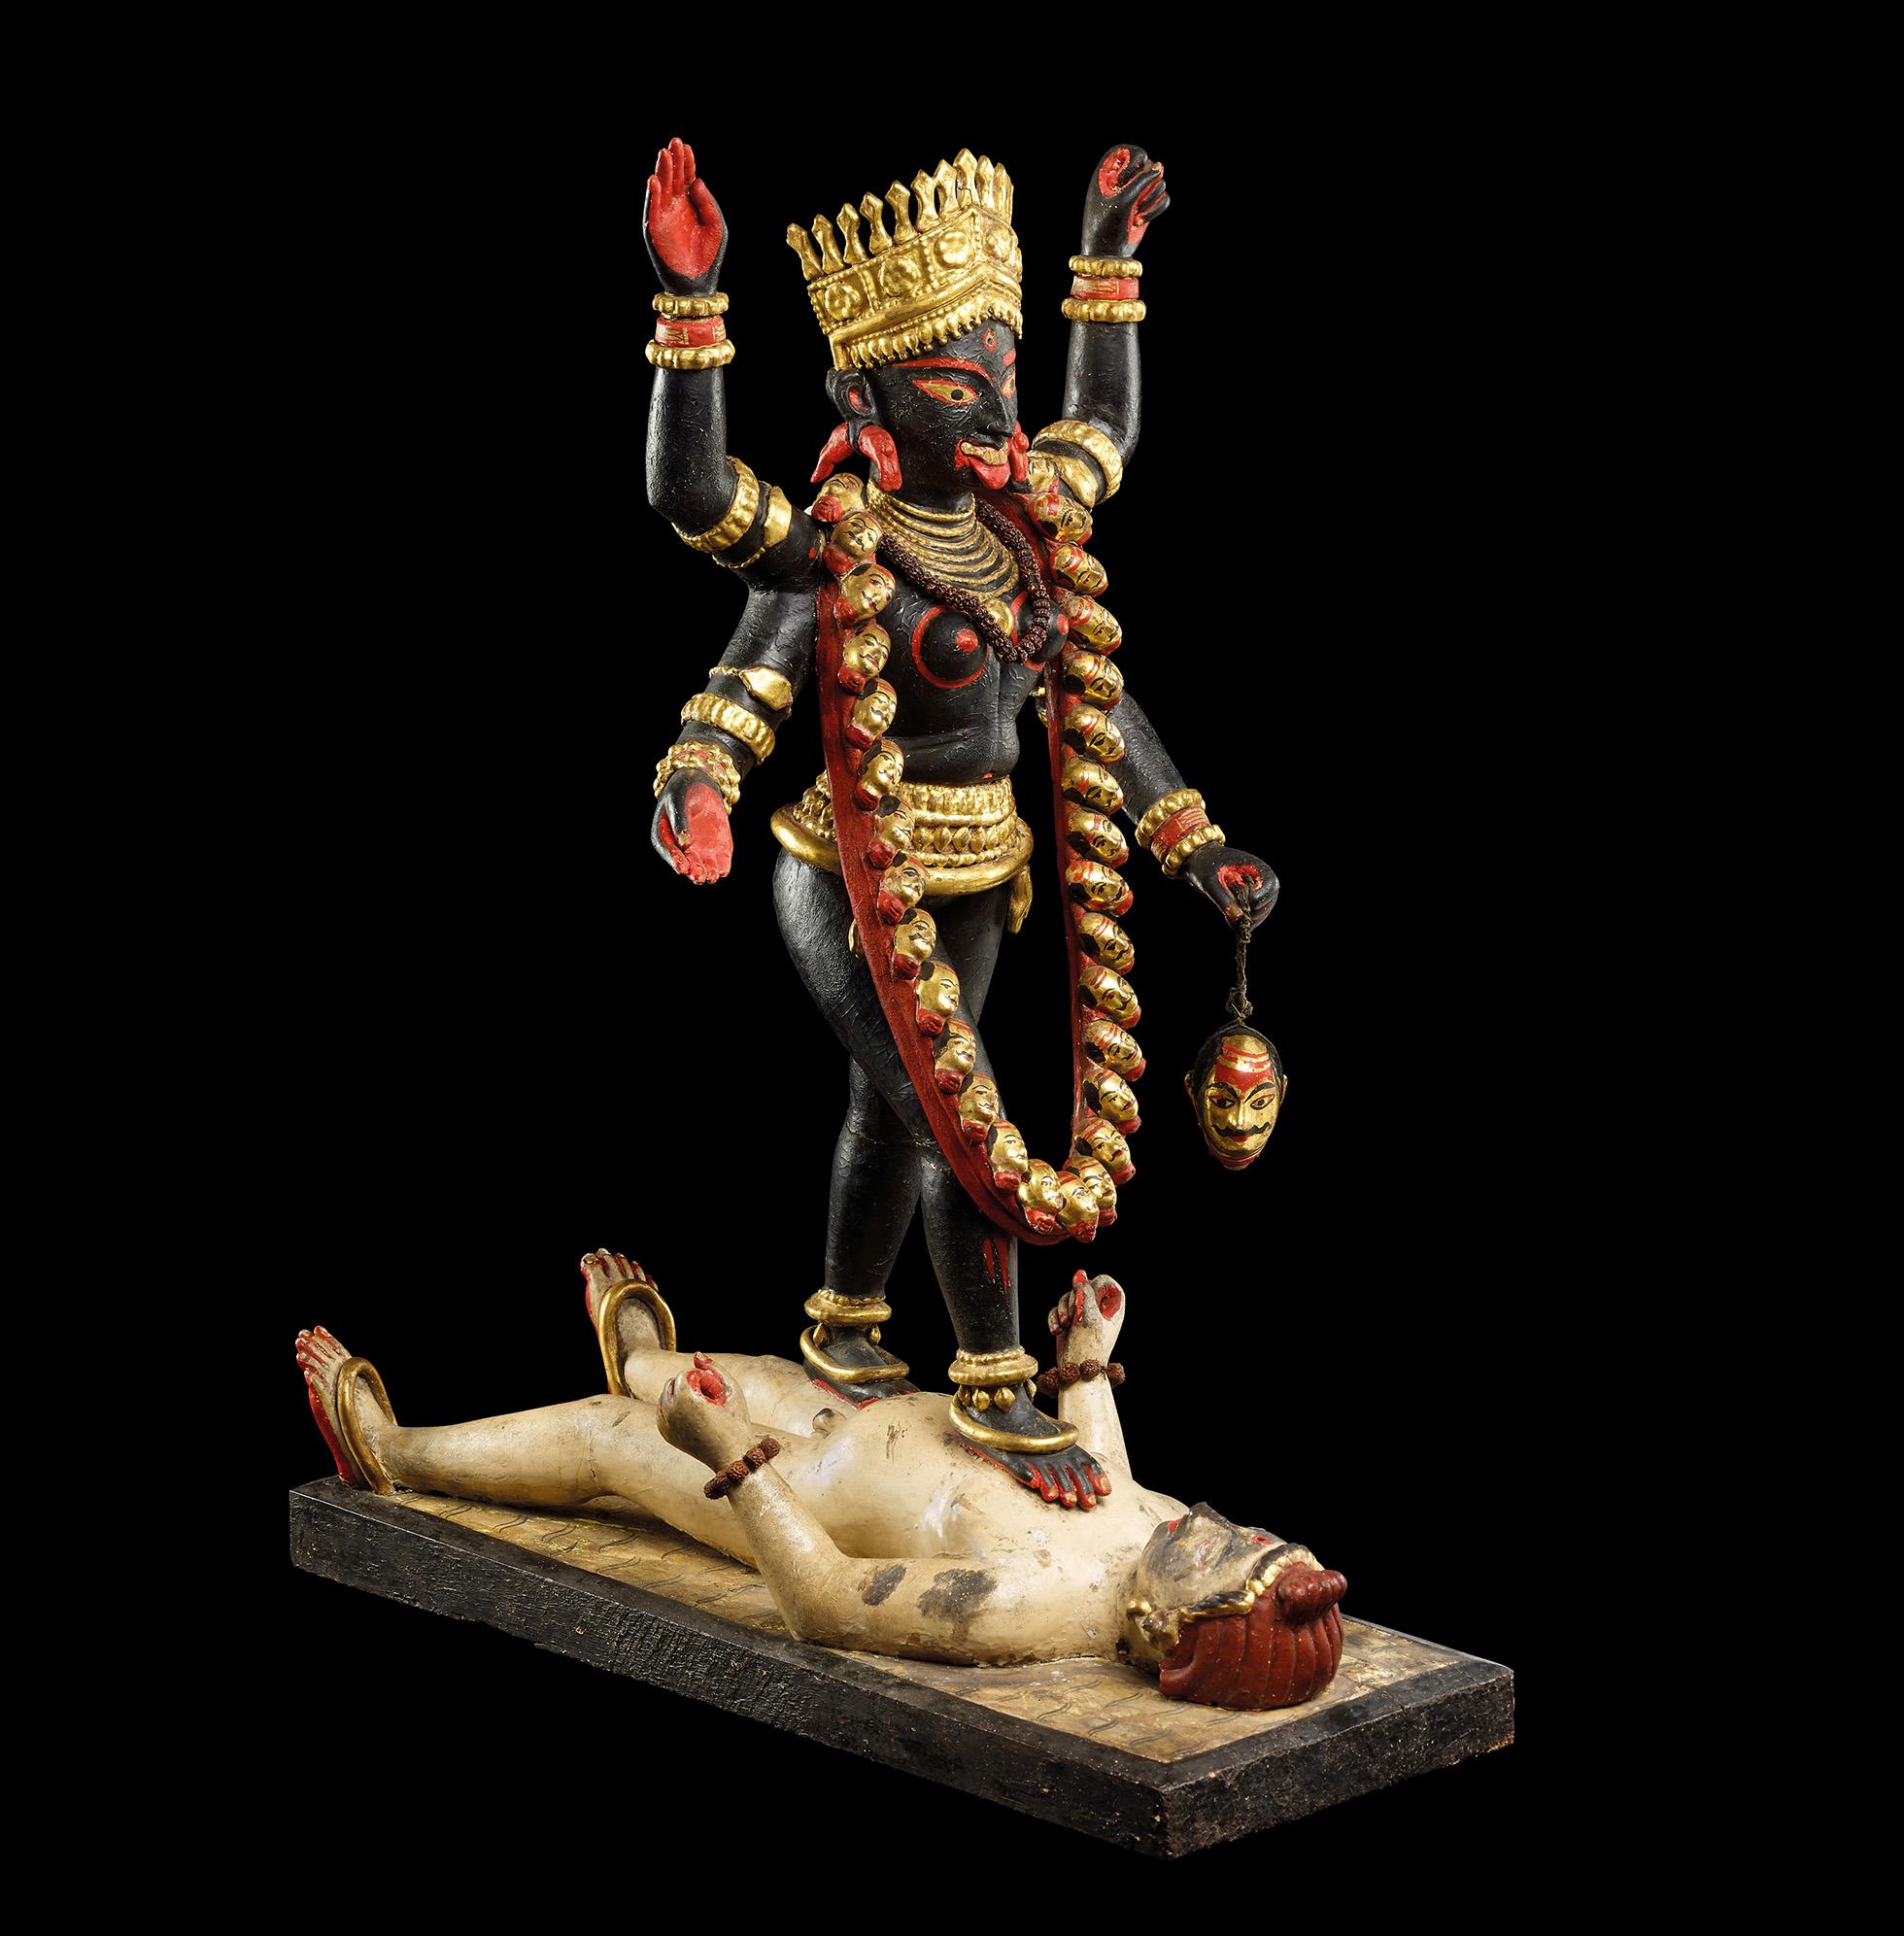 Yogini statue from 900AD displayed at the British Museum (Twitter, British Museum).